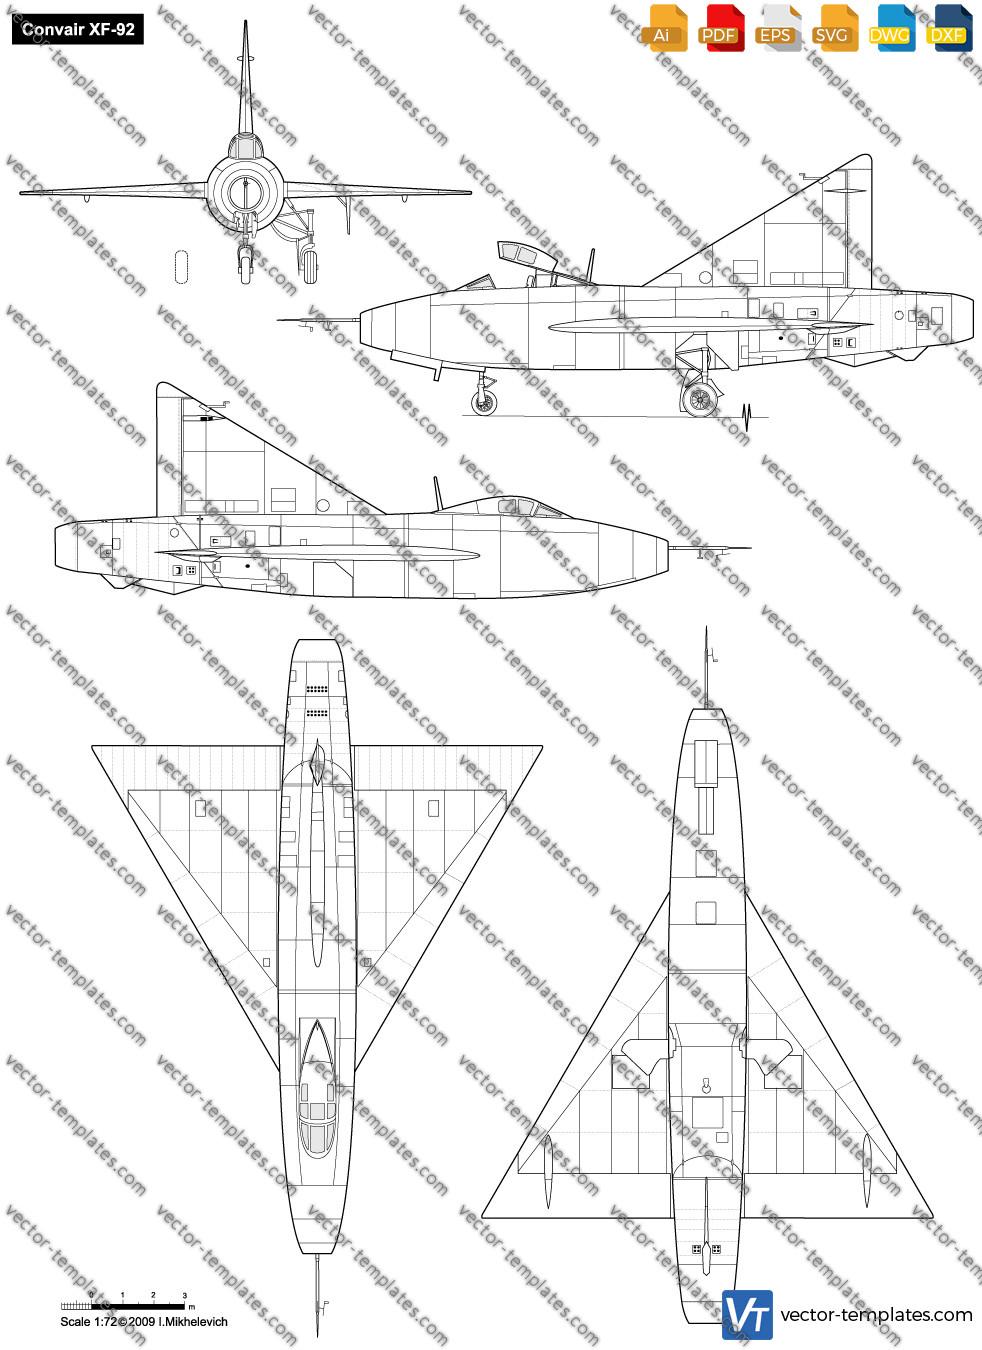 Convair XF-92